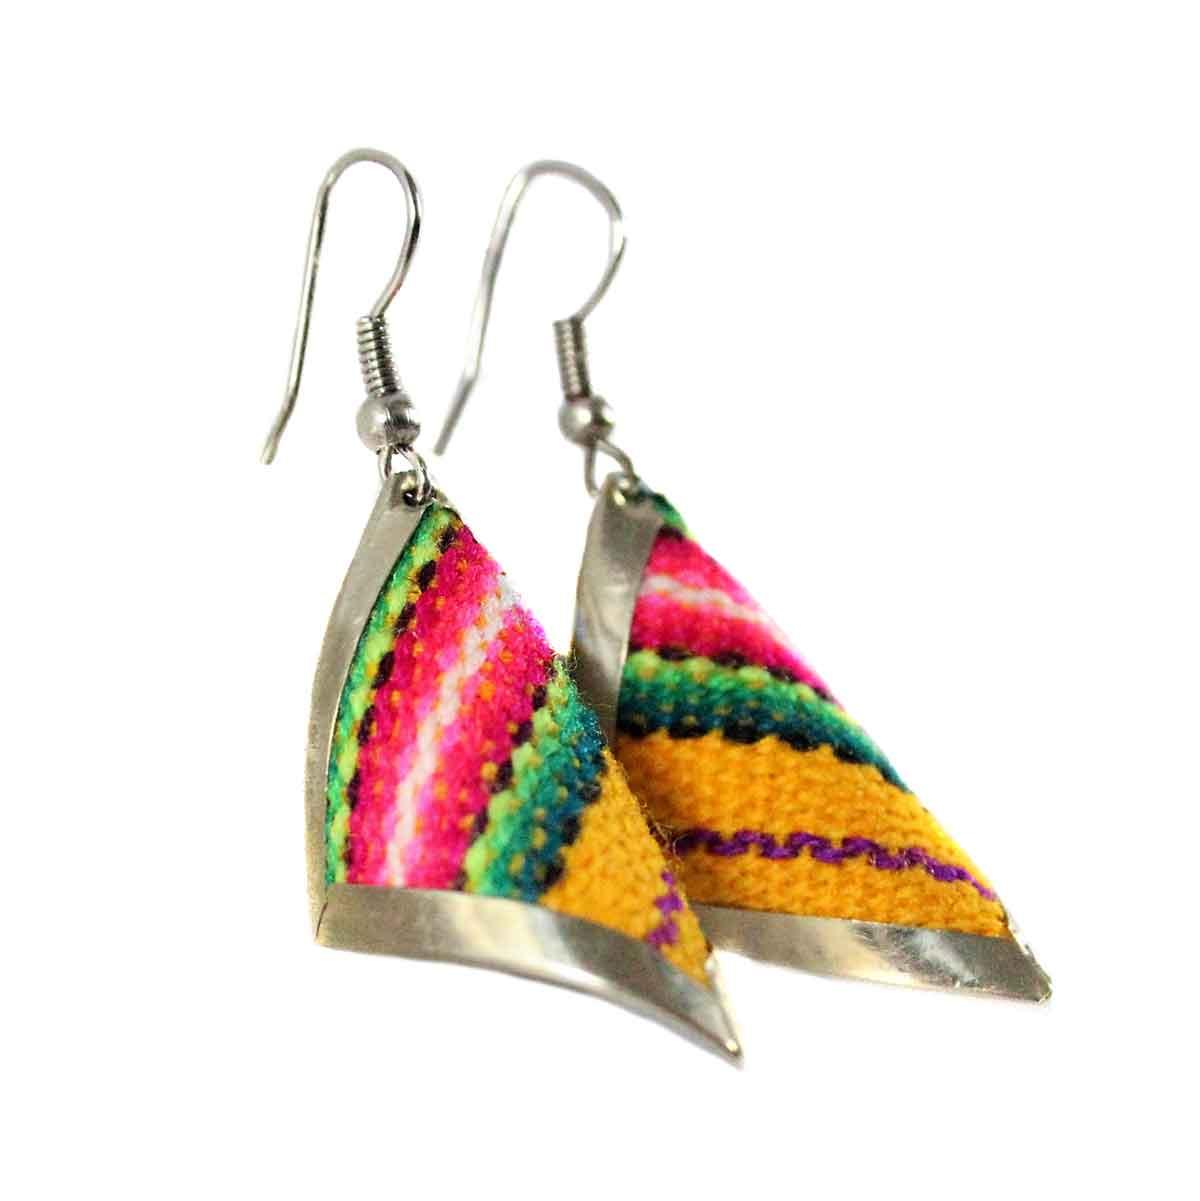 Inka-Products-Boucles d'Oreilles Tissu Traditionnel Péruvien-Carré Spiral Jaune-2